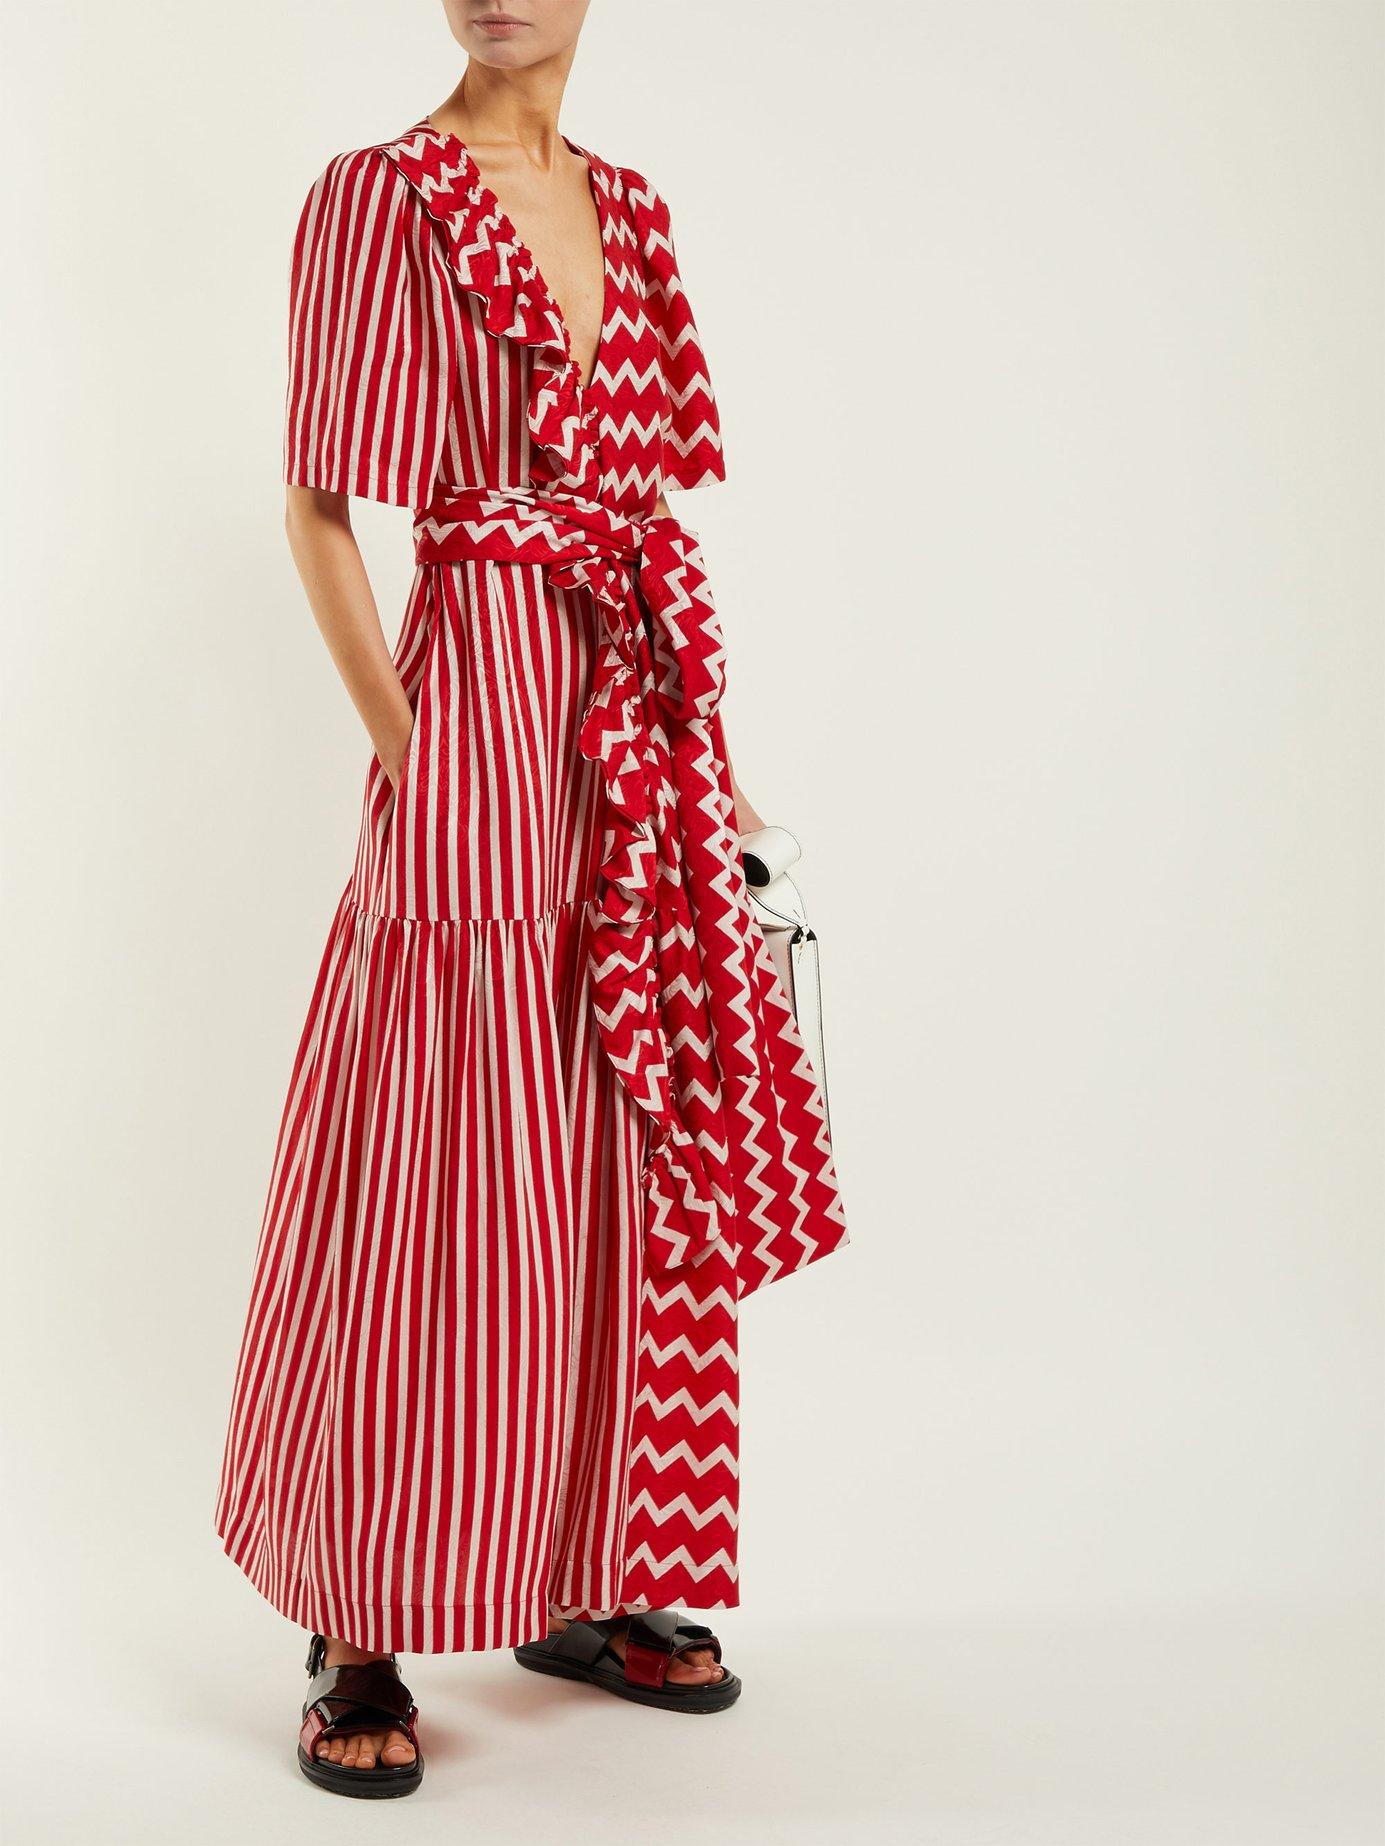 Gabrielle zigzag-print maxi dress by Stella Mccartney